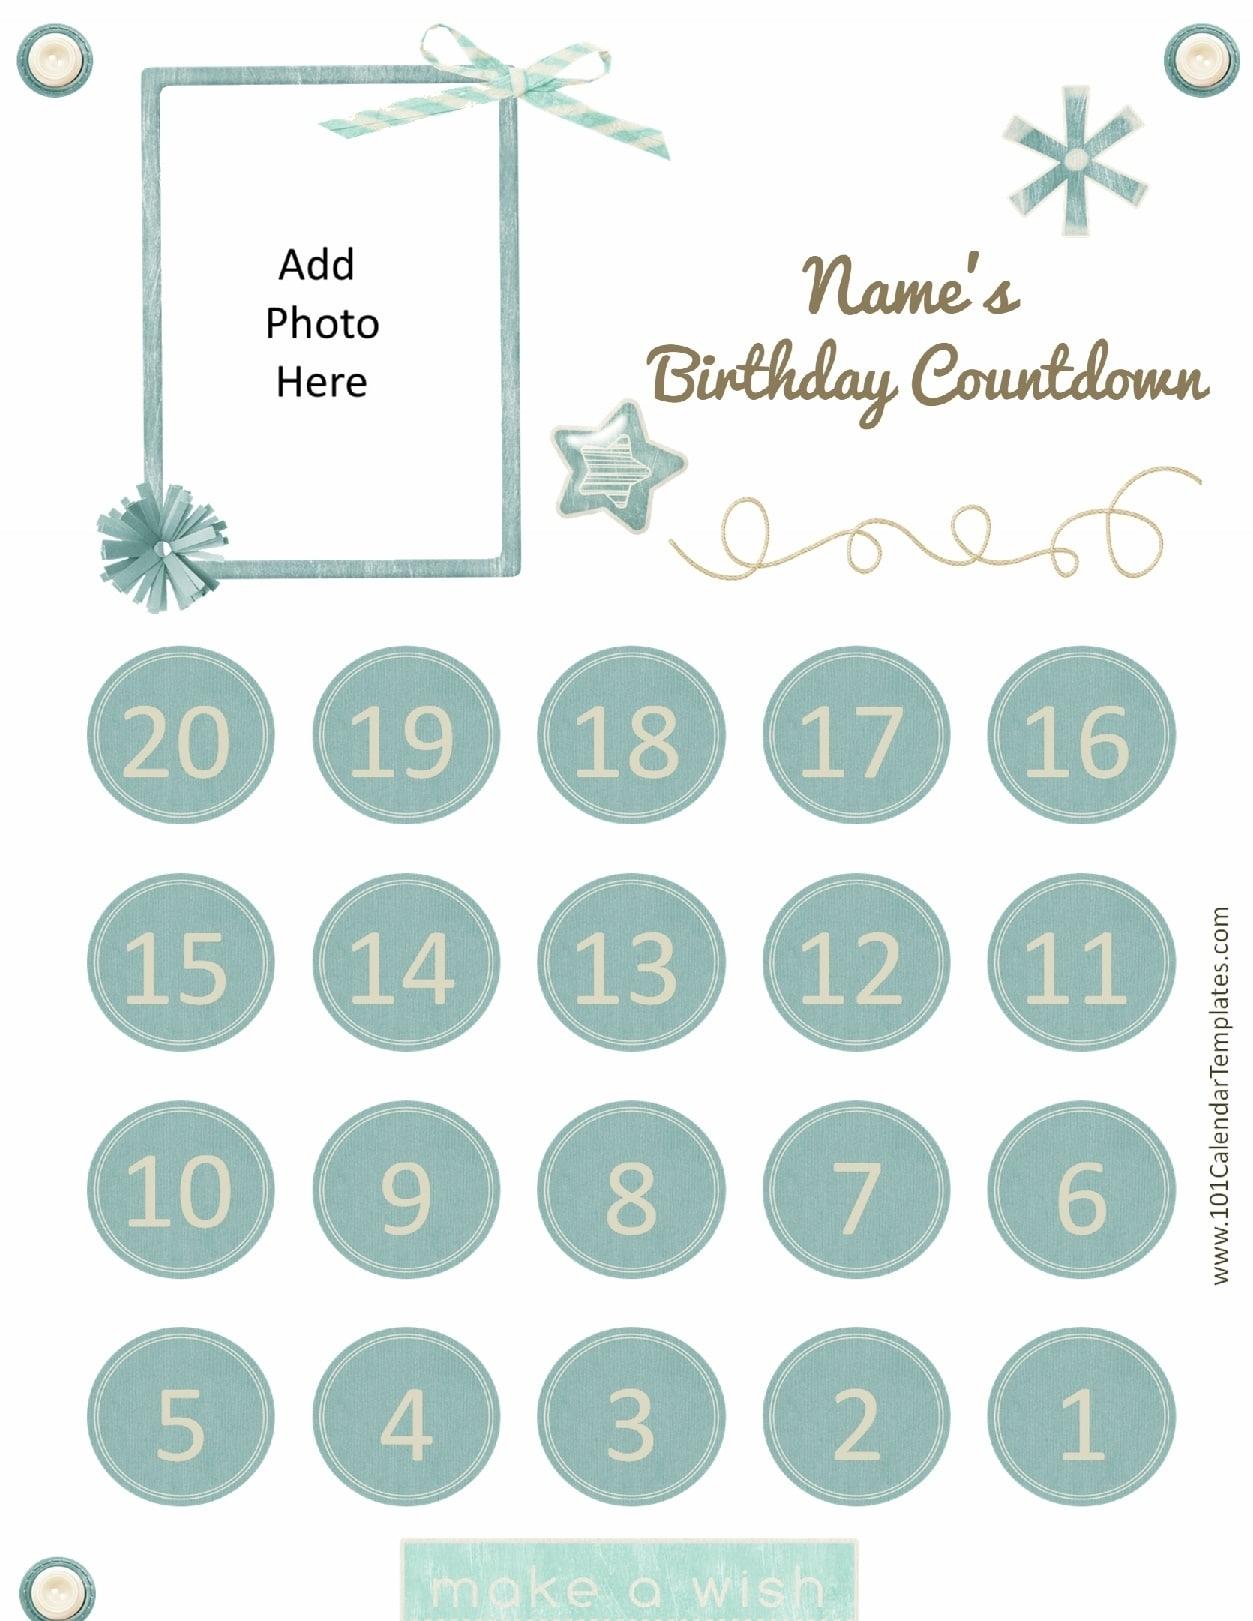 Printable Calendar Countdown | Printable Calendar 2019 Calendar Countdown To Print